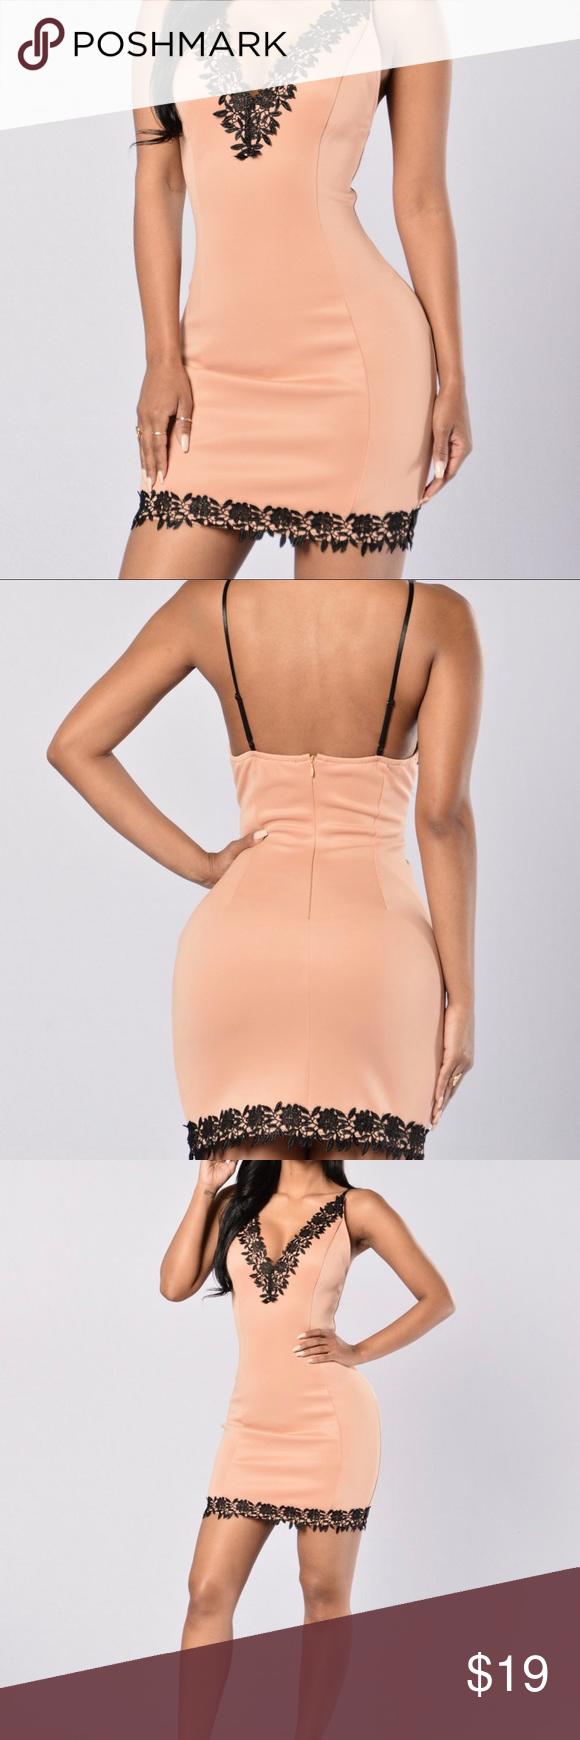 81423142f2c Fashion Nova Nude pink and black dress. Size  S